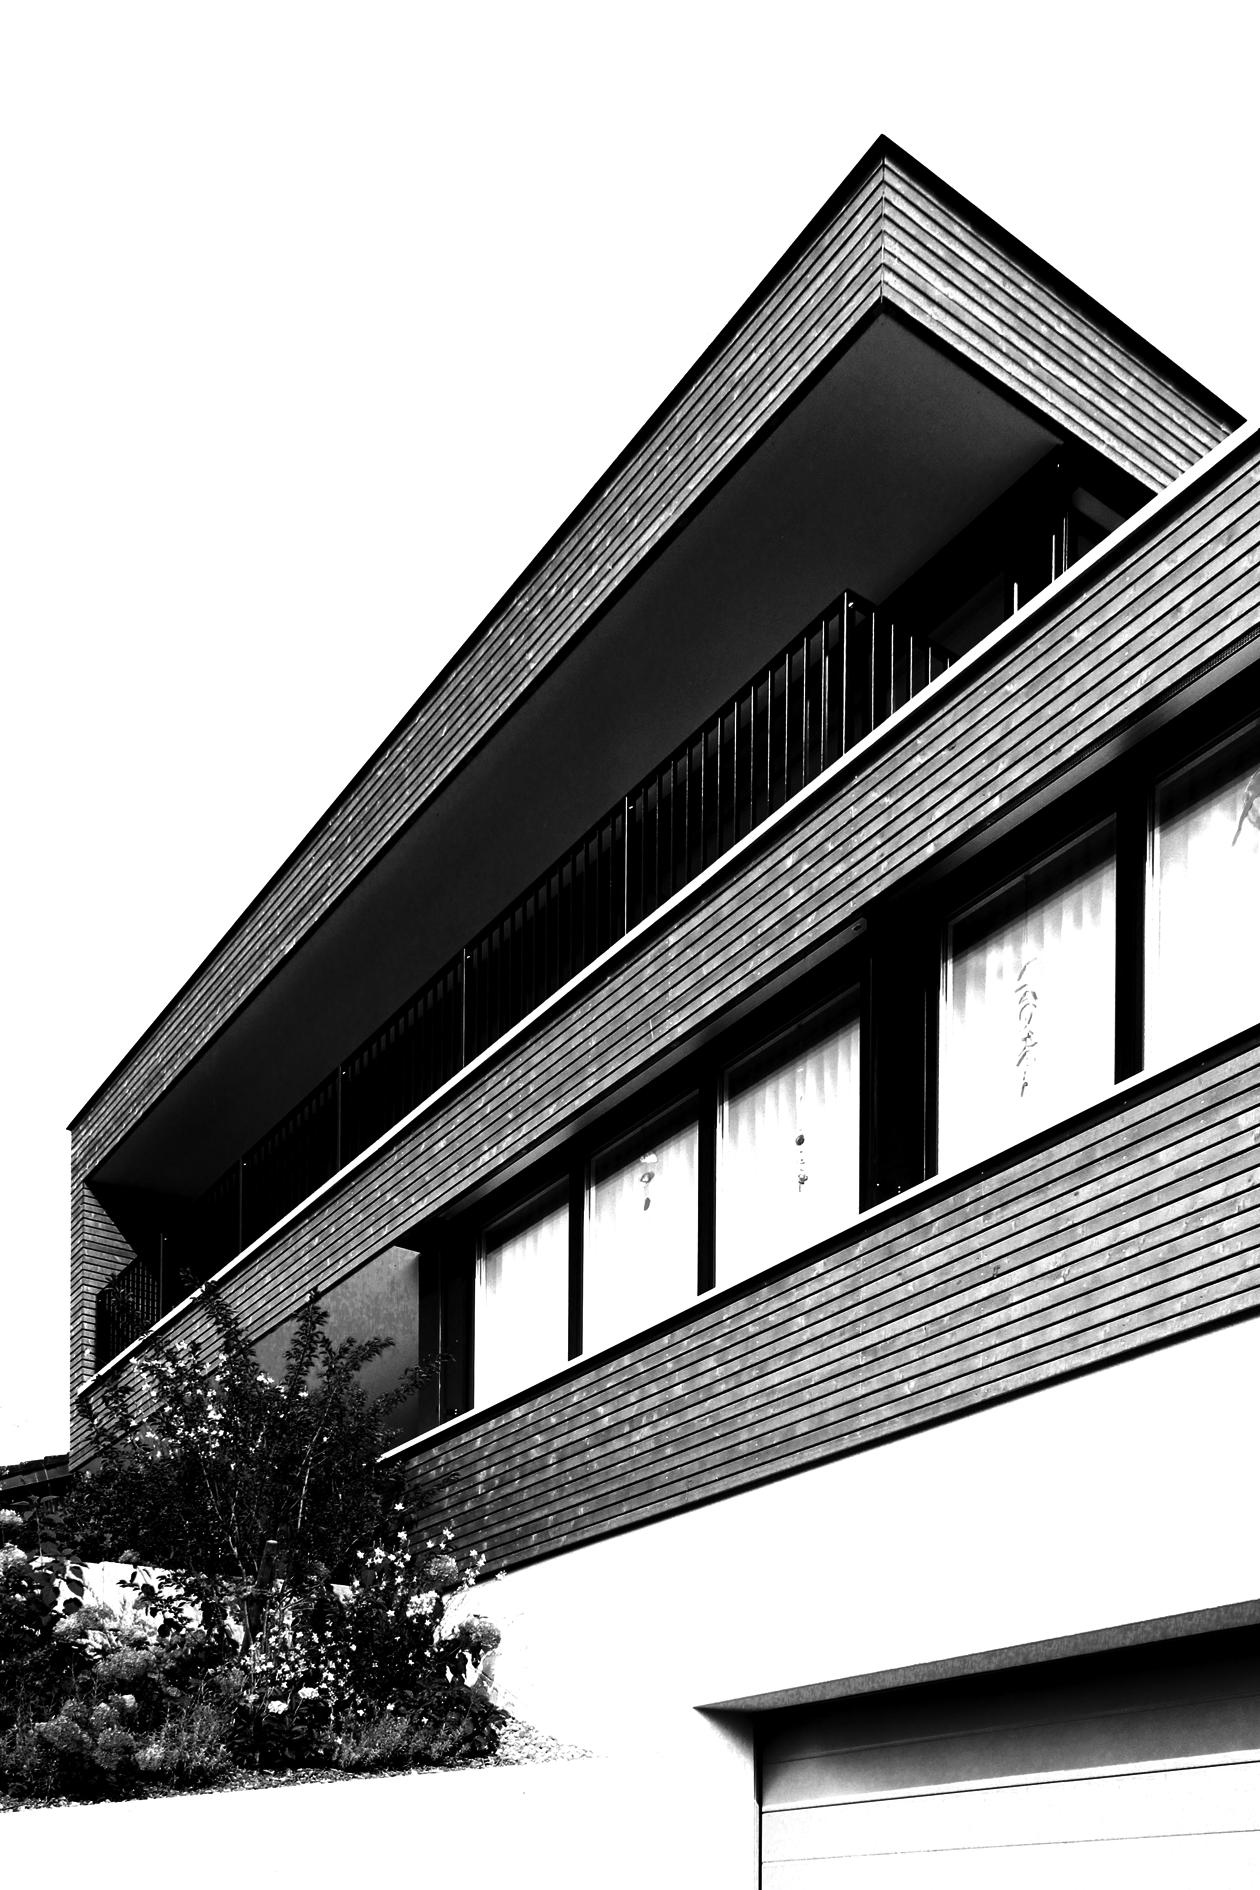 efh s ntisstrasse eigen gmbh architektur design. Black Bedroom Furniture Sets. Home Design Ideas